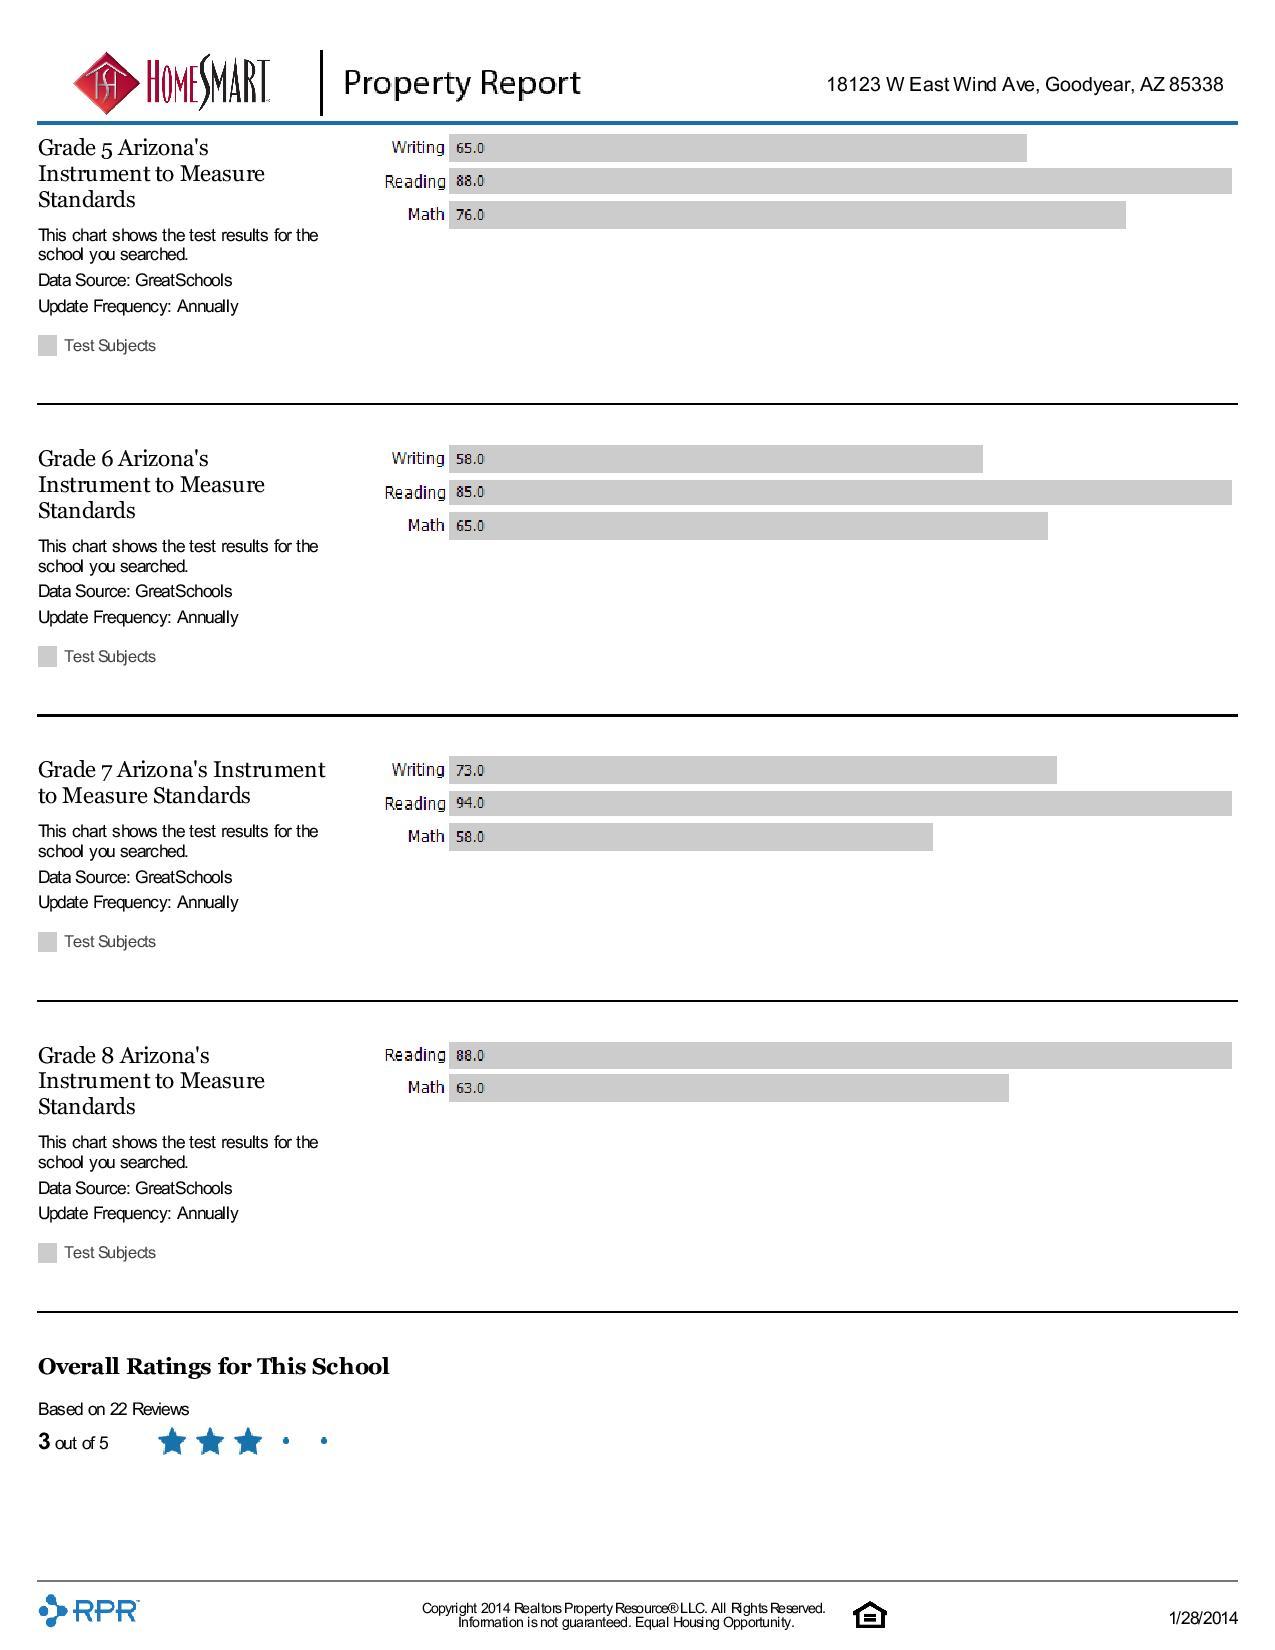 18123-W-East-Wind-Ave-Goodyear-AZ-85338.pdf-page-013